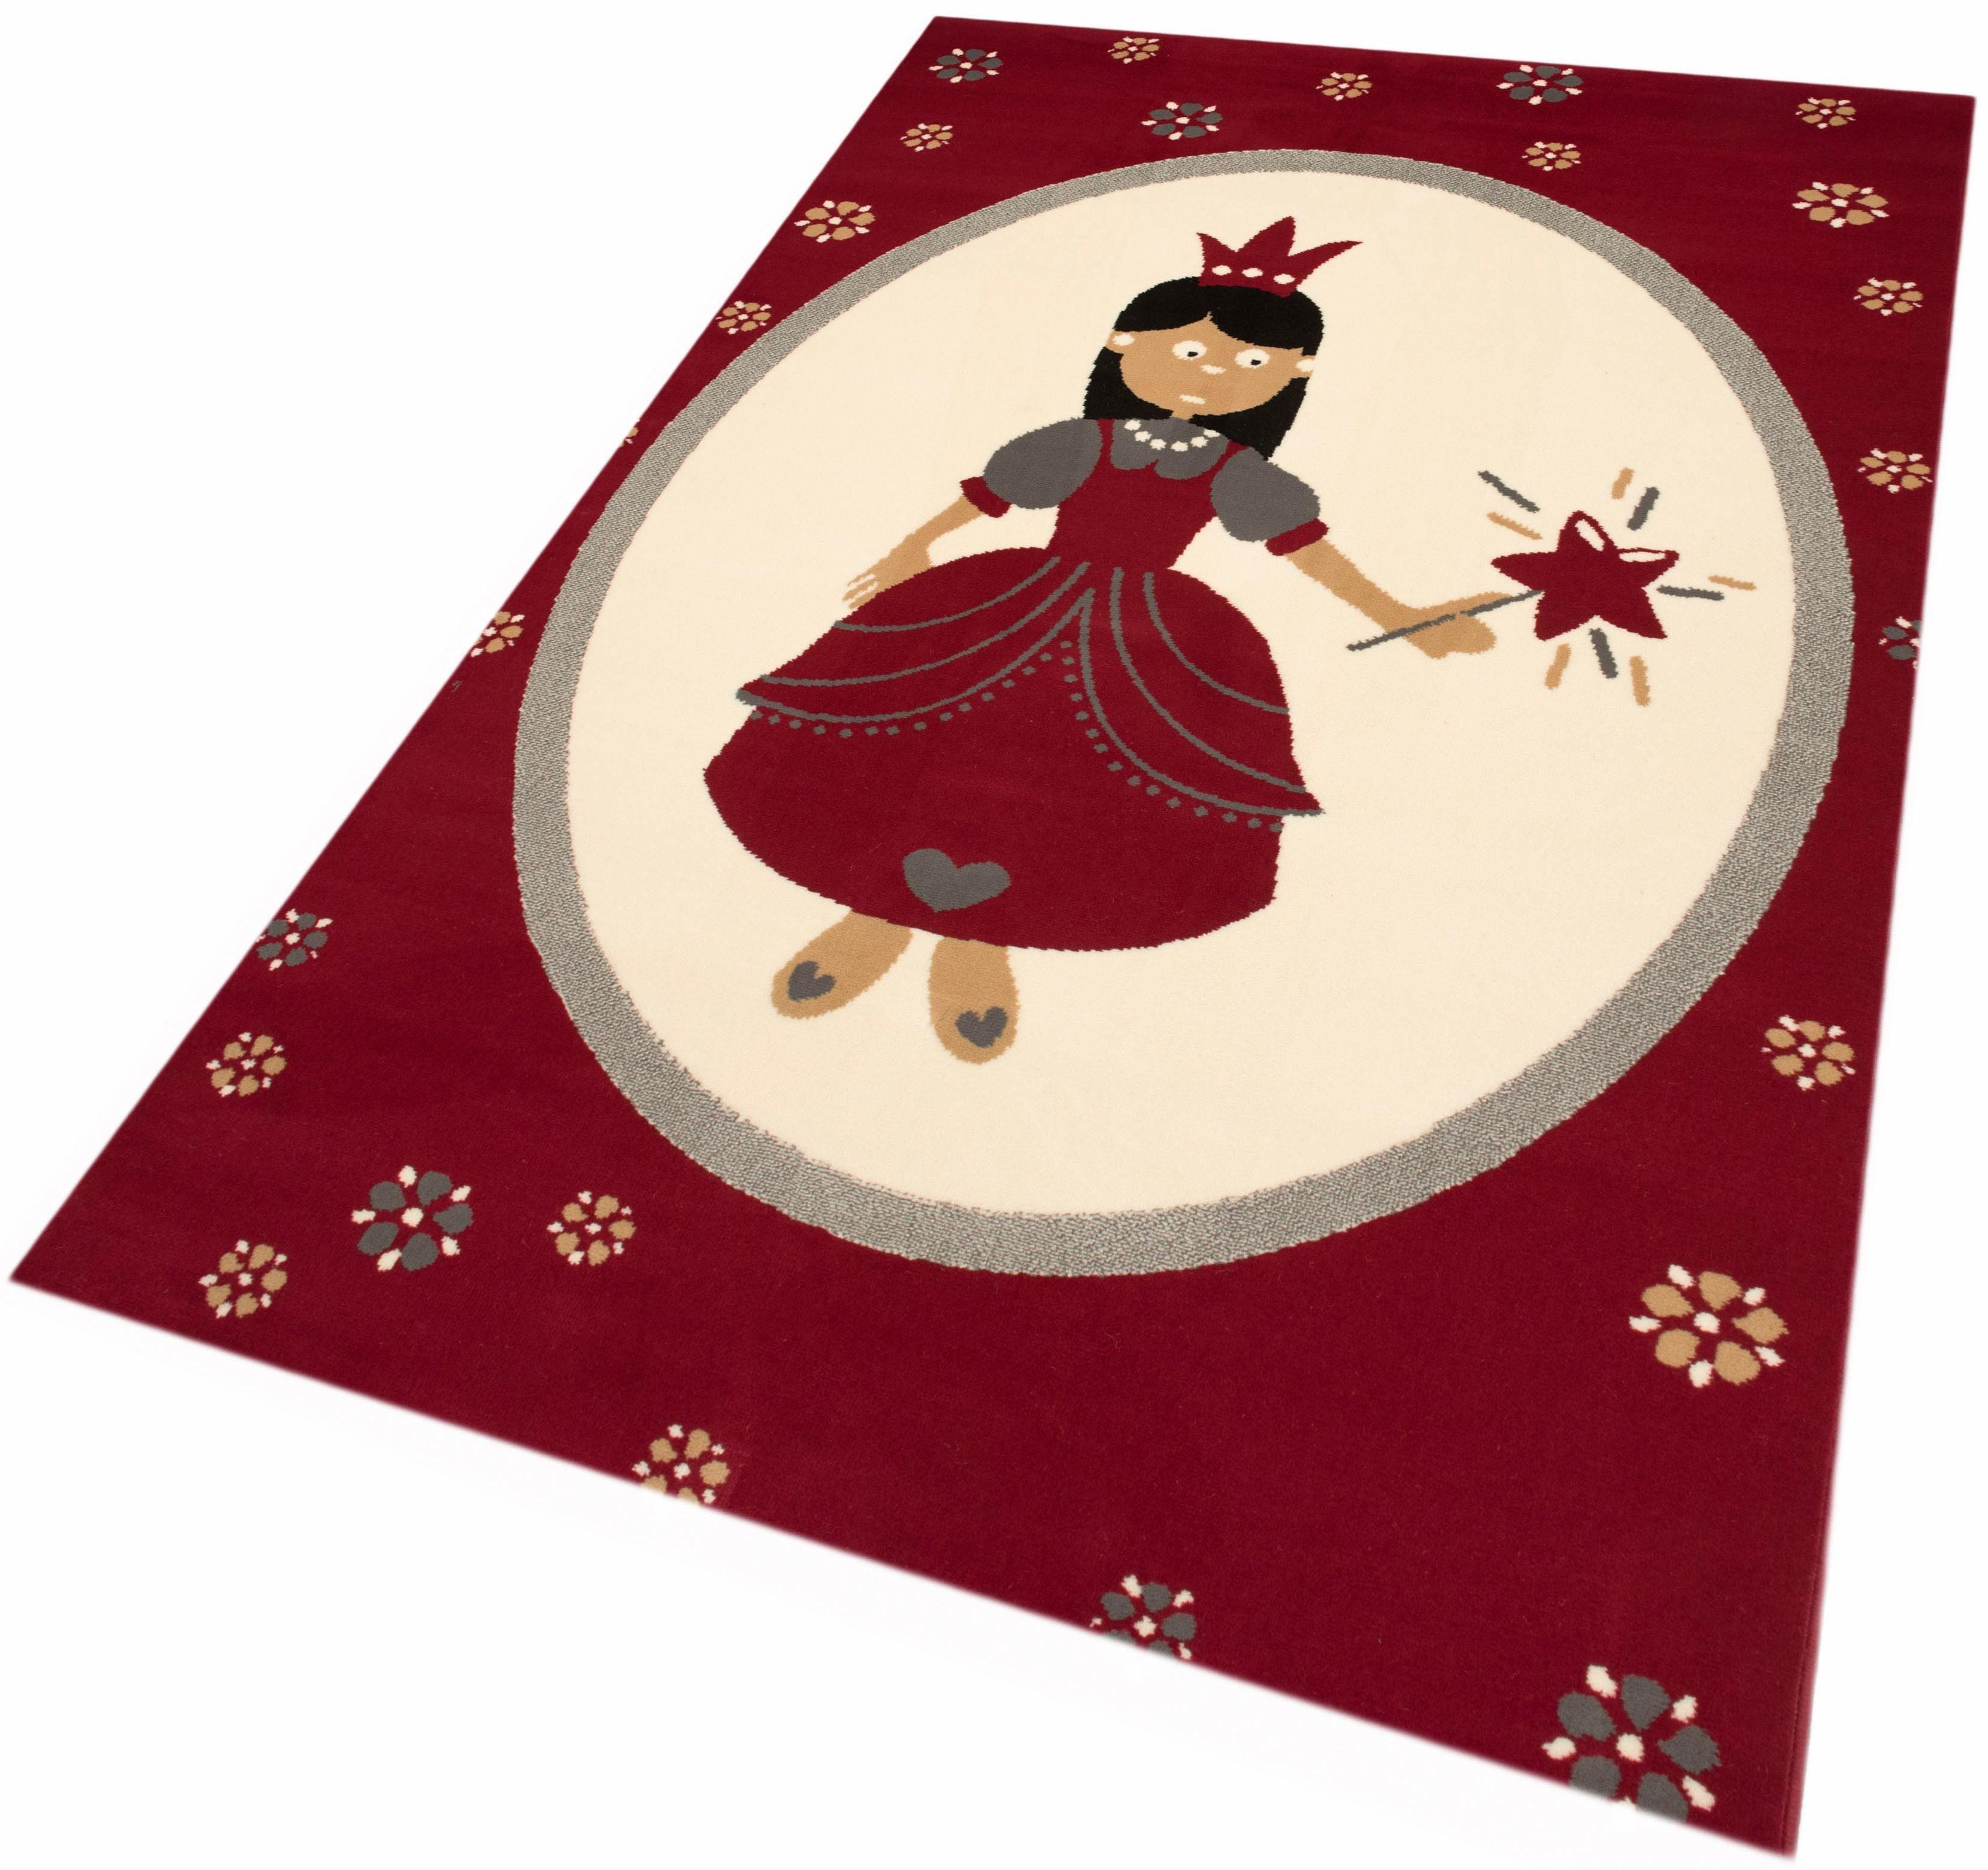 Kinderteppich »Prinzessin«, Zala Living, rechteckig, Höhe 9 mm